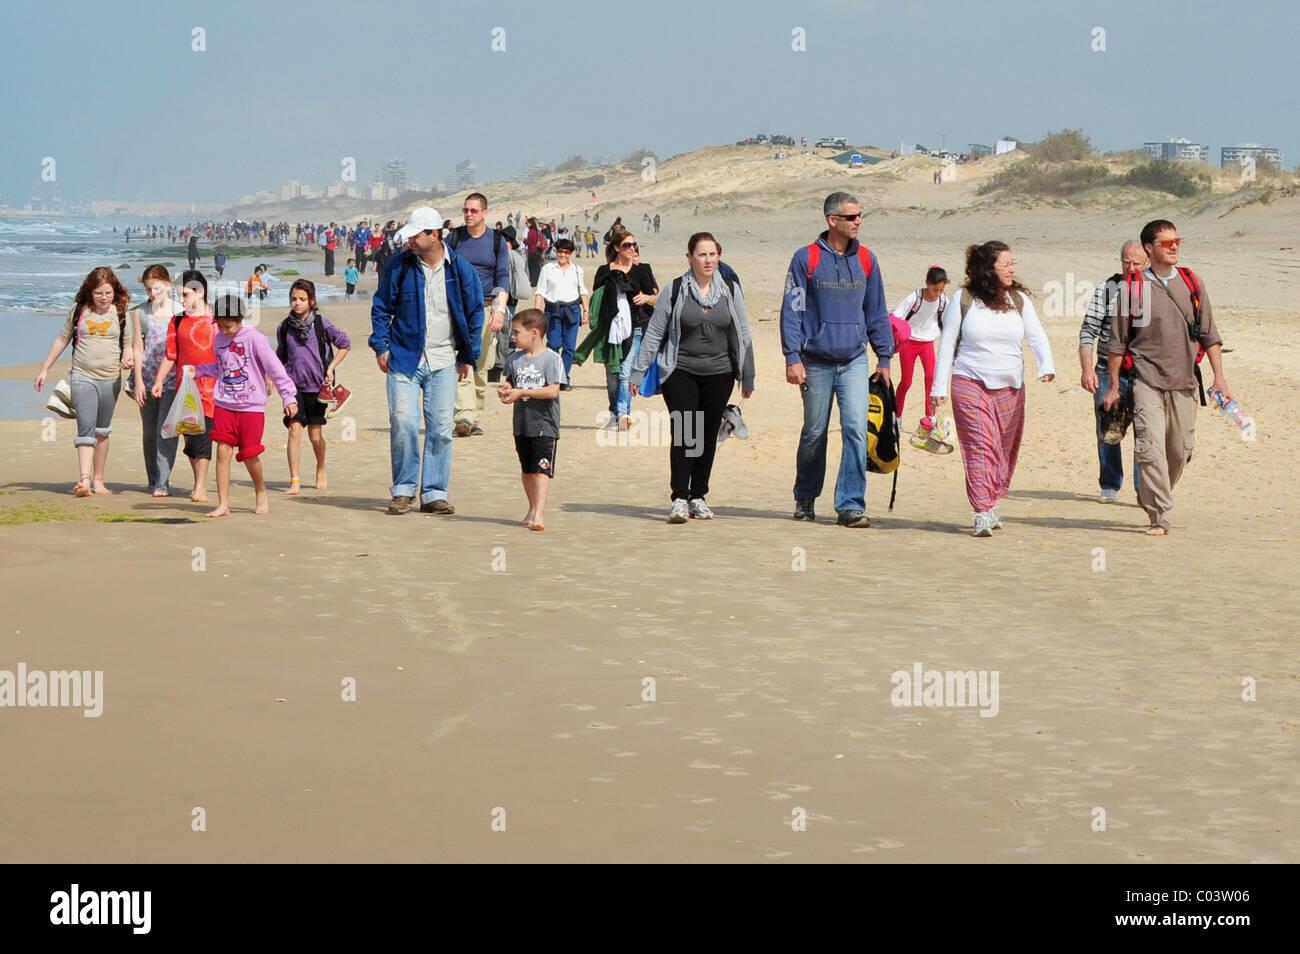 The 16 Sand Dunes March in NItzanim Beach Ashdod Israel Stock Photo